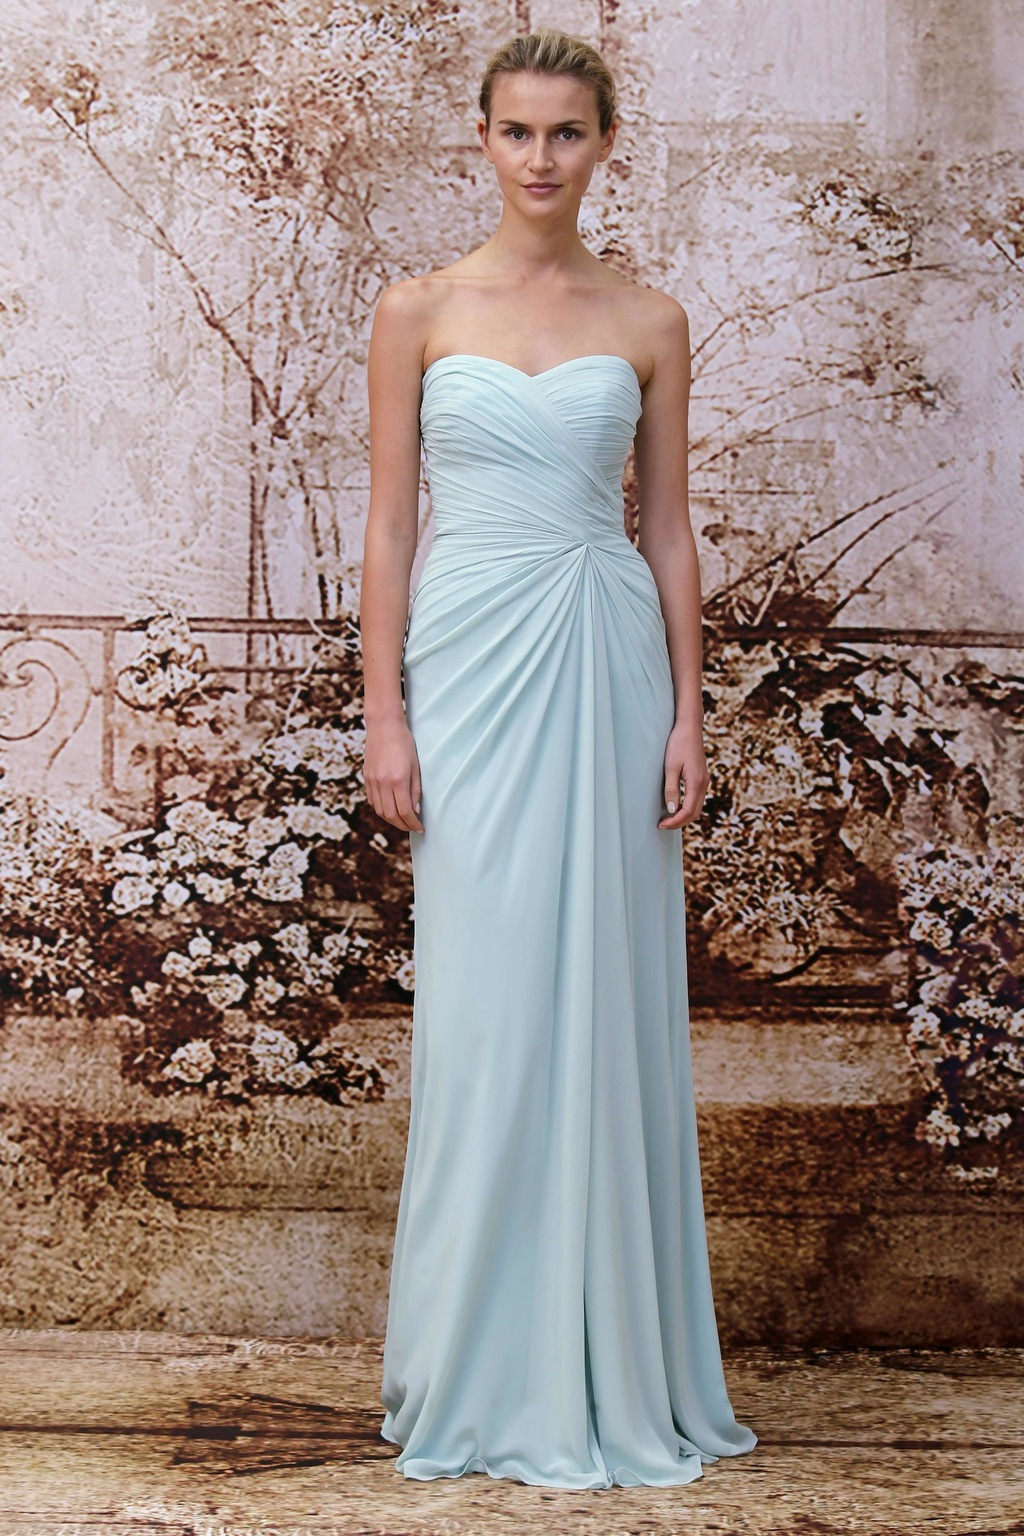 Mint_bridesmaids_dress_from_monique_lhuillier.full